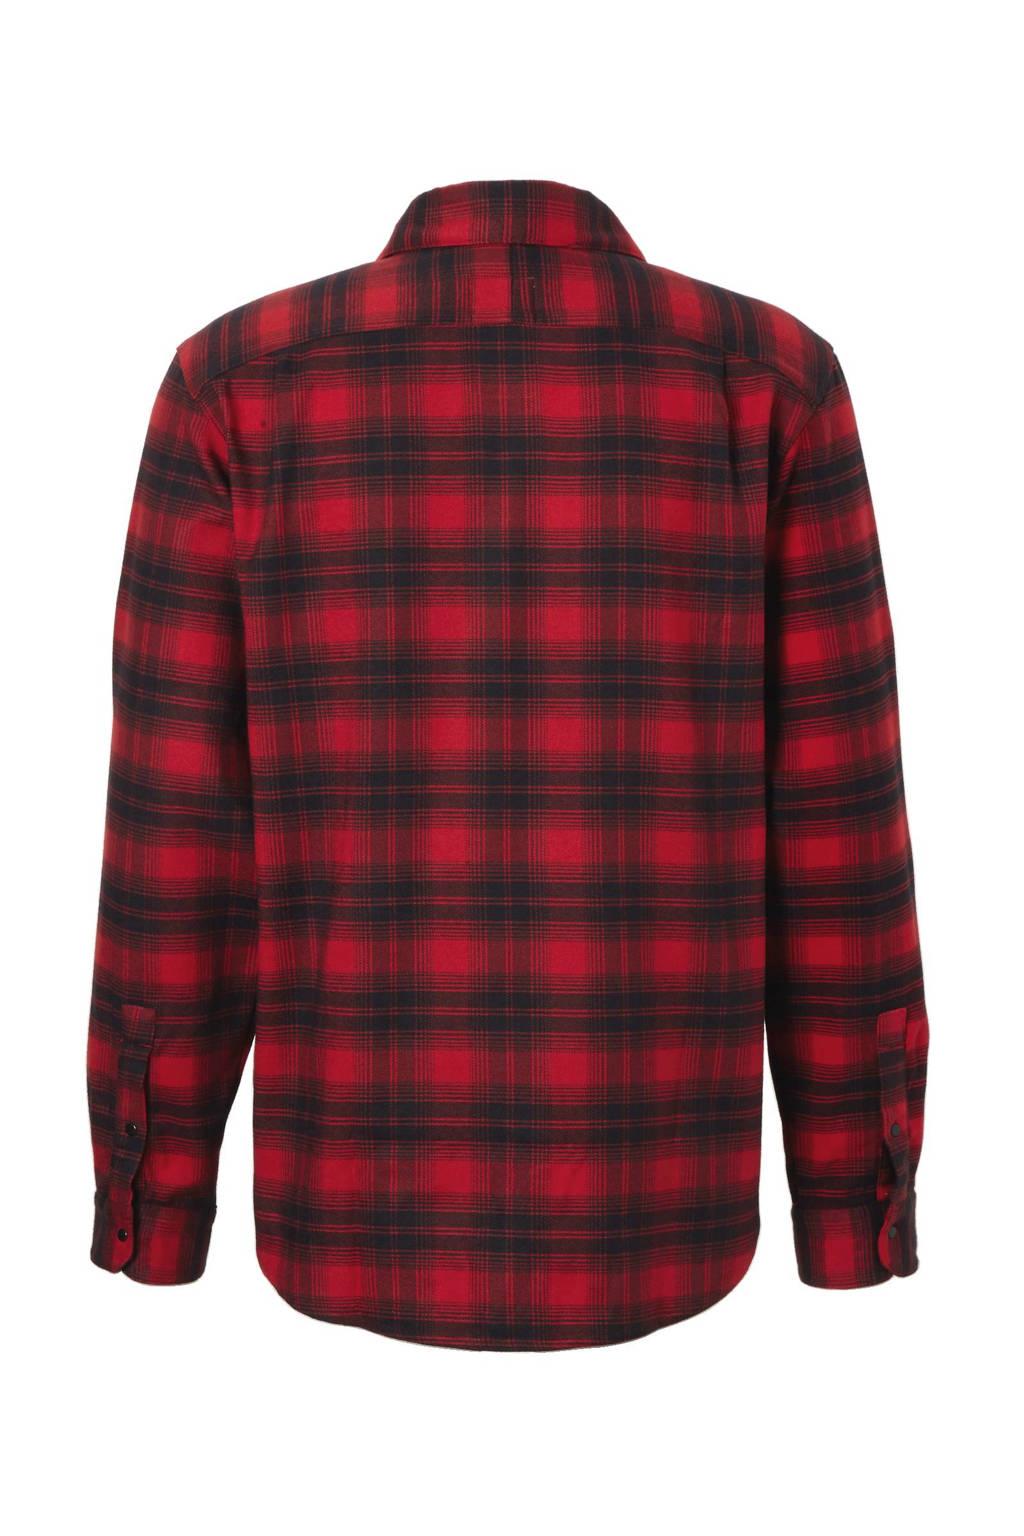 Overhemd Rood Zwart.Adidas Performance Flanellen Overhemd Wehkamp